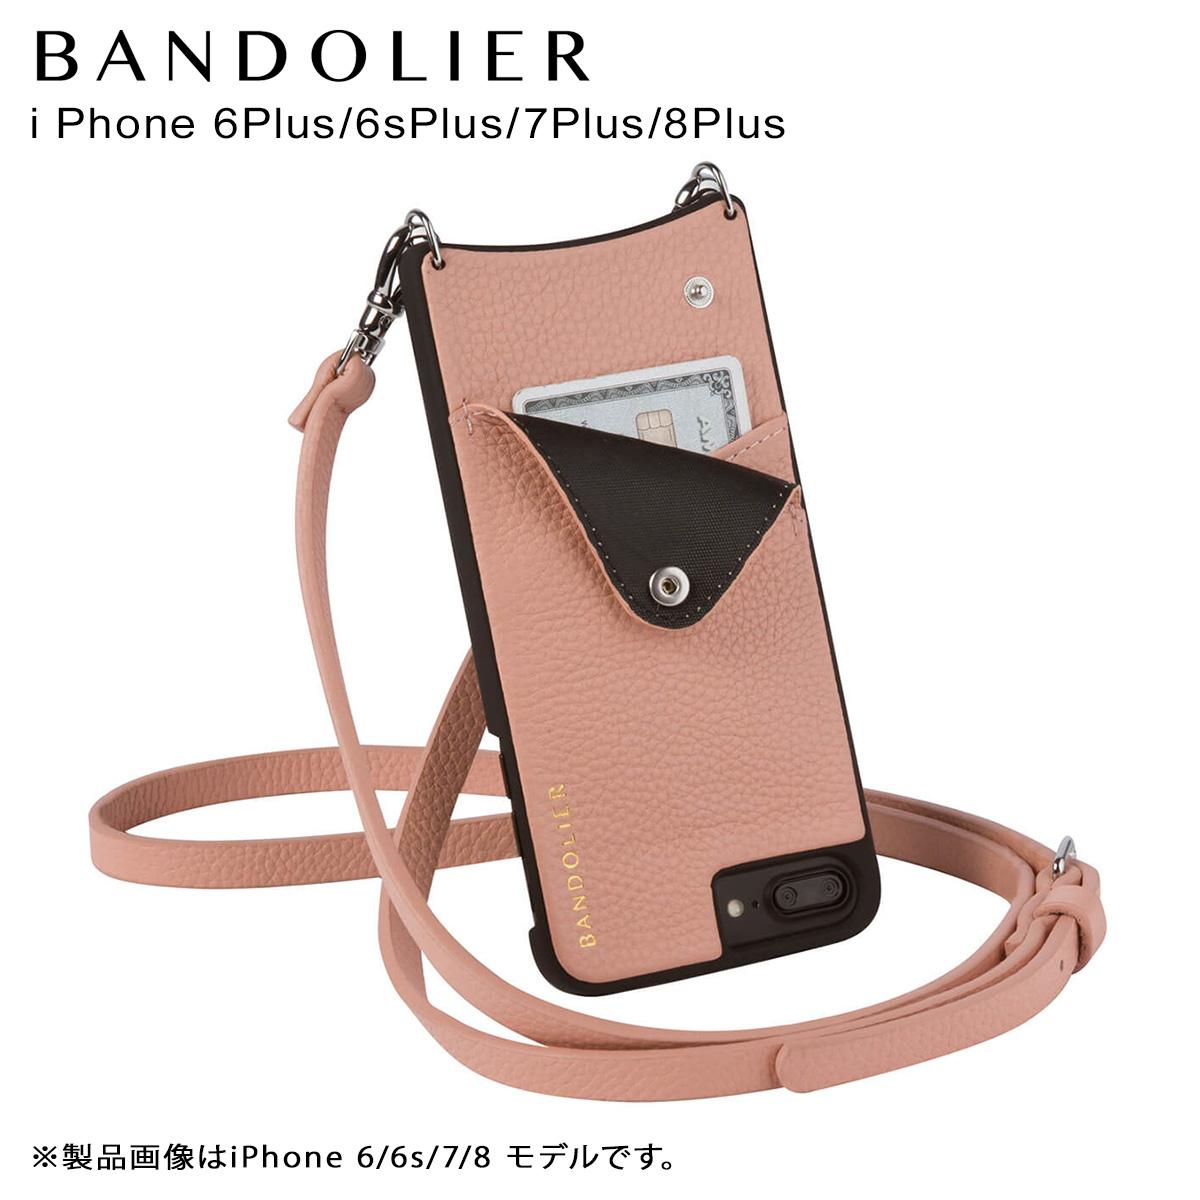 BANDOLIER iPhone8Plus iPhone7Plus 6sPlus EMMA BLUSH バンドリヤー ケース スマホ アイフォン プラス メンズ レディース [3/18 再入荷]